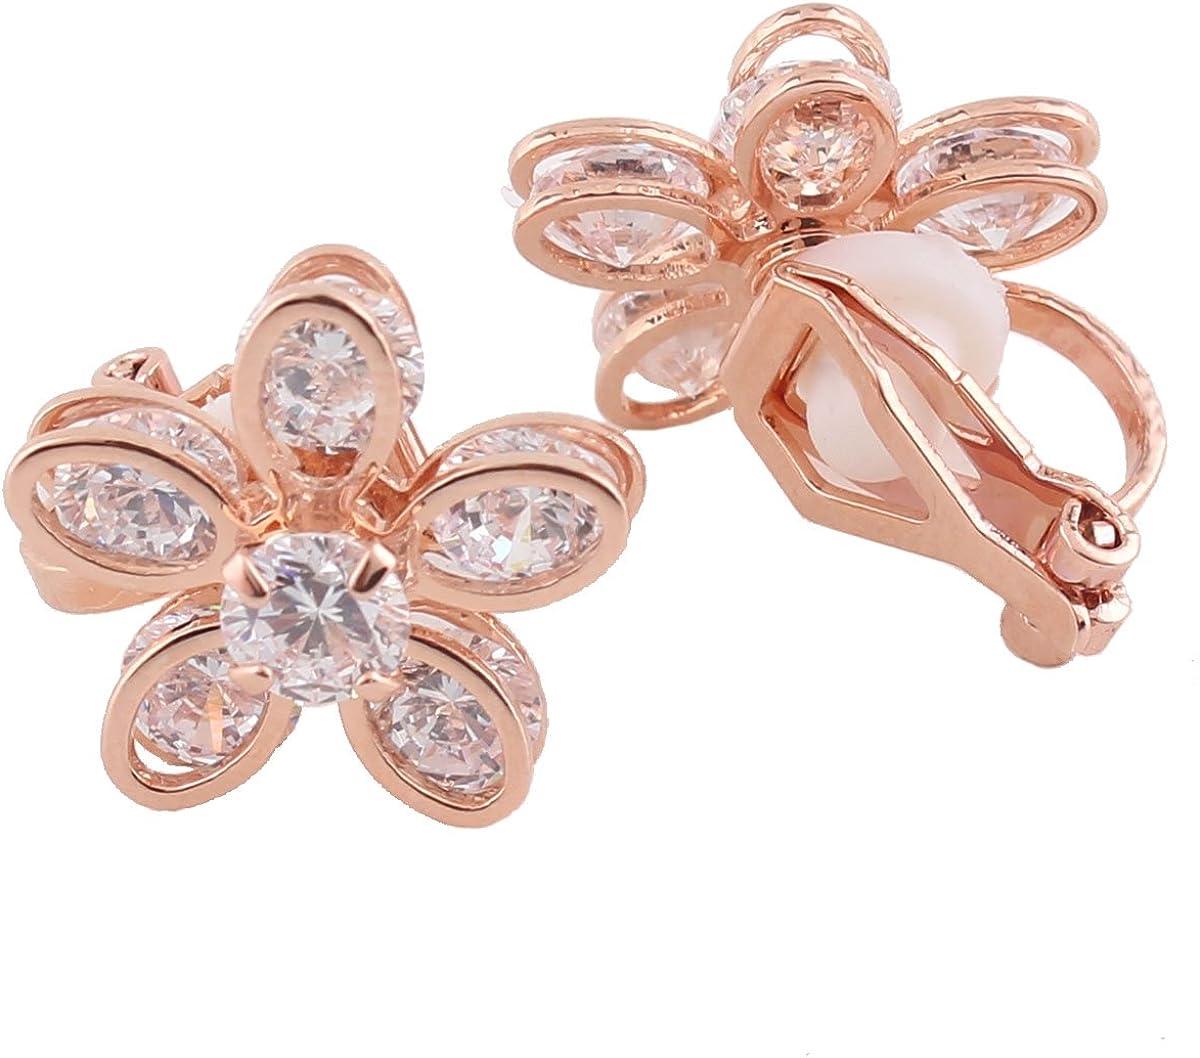 Grace Jun Bridal AAA Cubic Zirconia Clip on Earrings Without Piercing Copper Material Flower Earrings